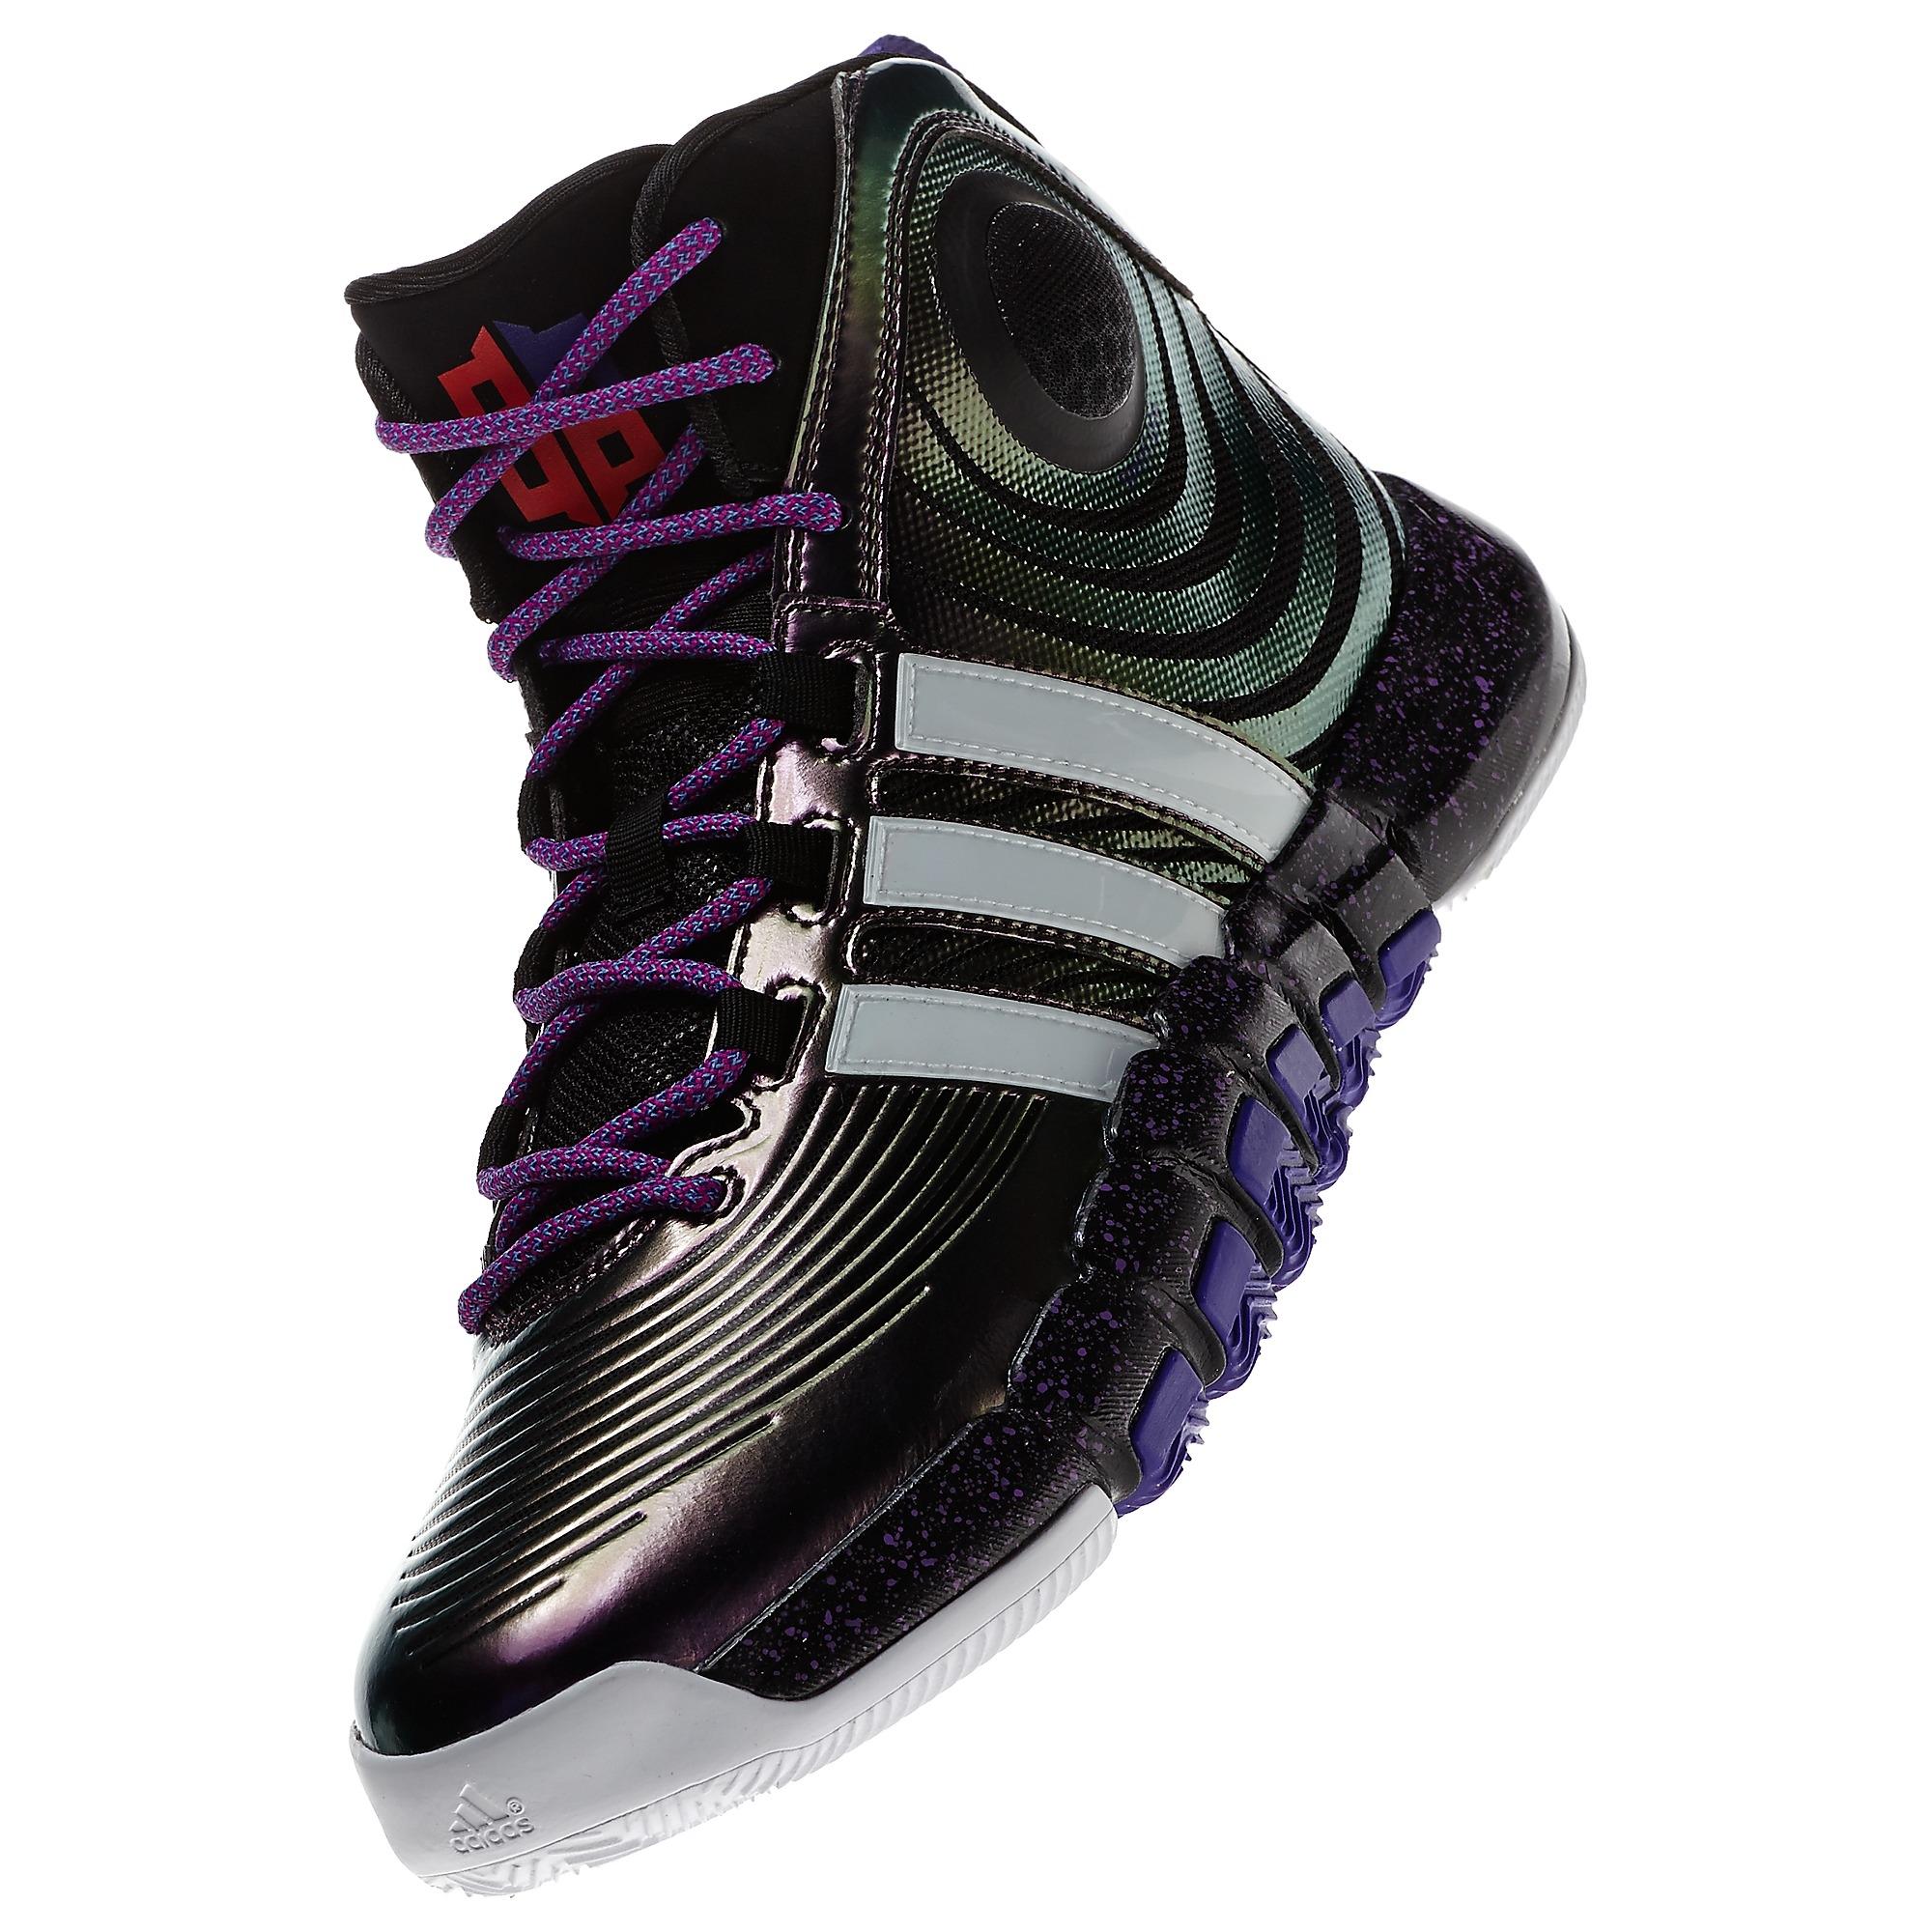 sports shoes aecc3 163ab adidas Dwight Howard 4 Synthetic Erkek Basketbol Ayakkabısı